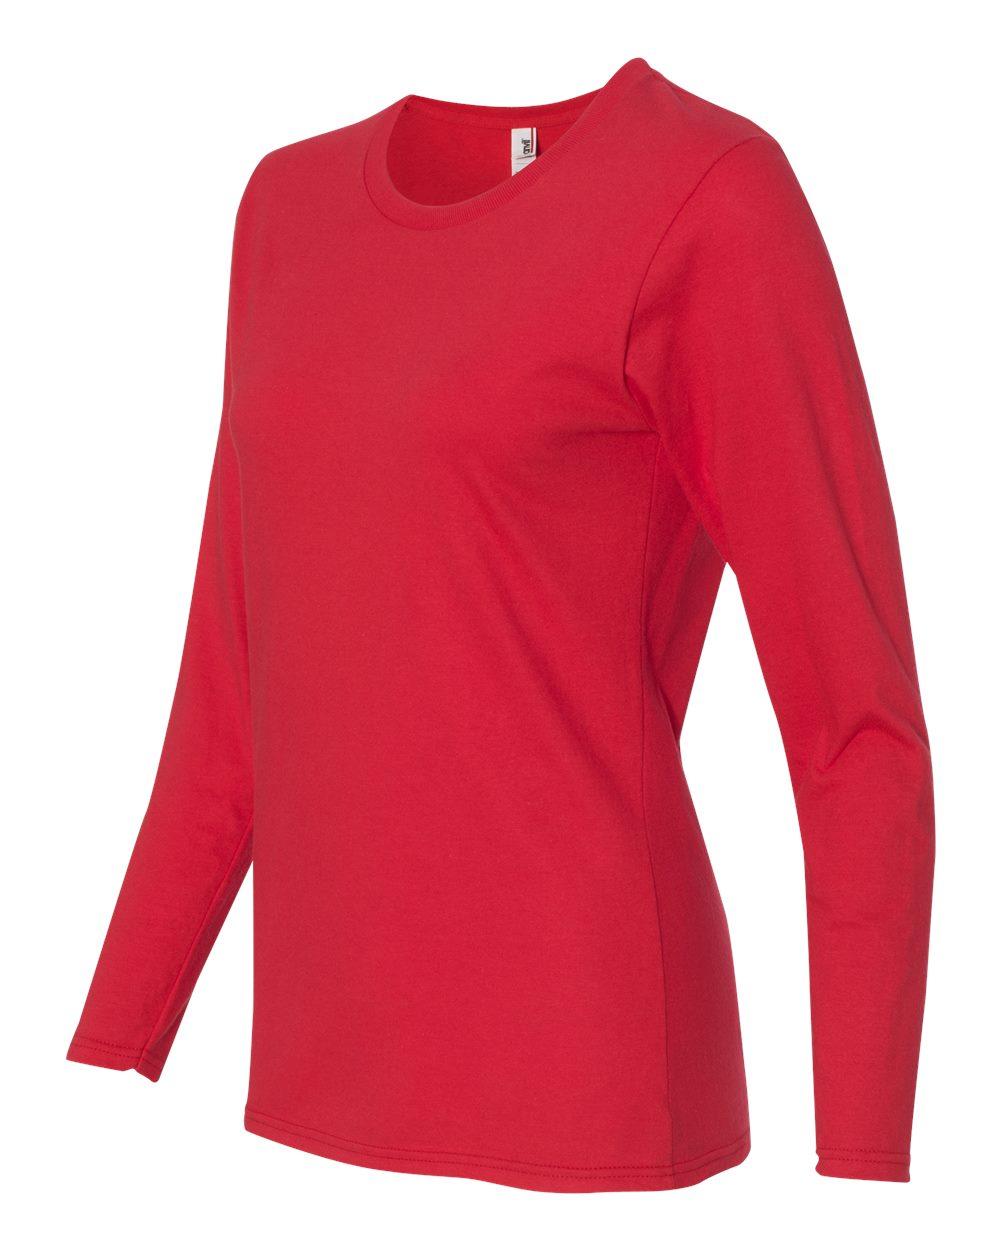 Anvil-Womens-Lightweight-Long-Sleeve-T-Shirt-884L-Size-S-2XL thumbnail 25